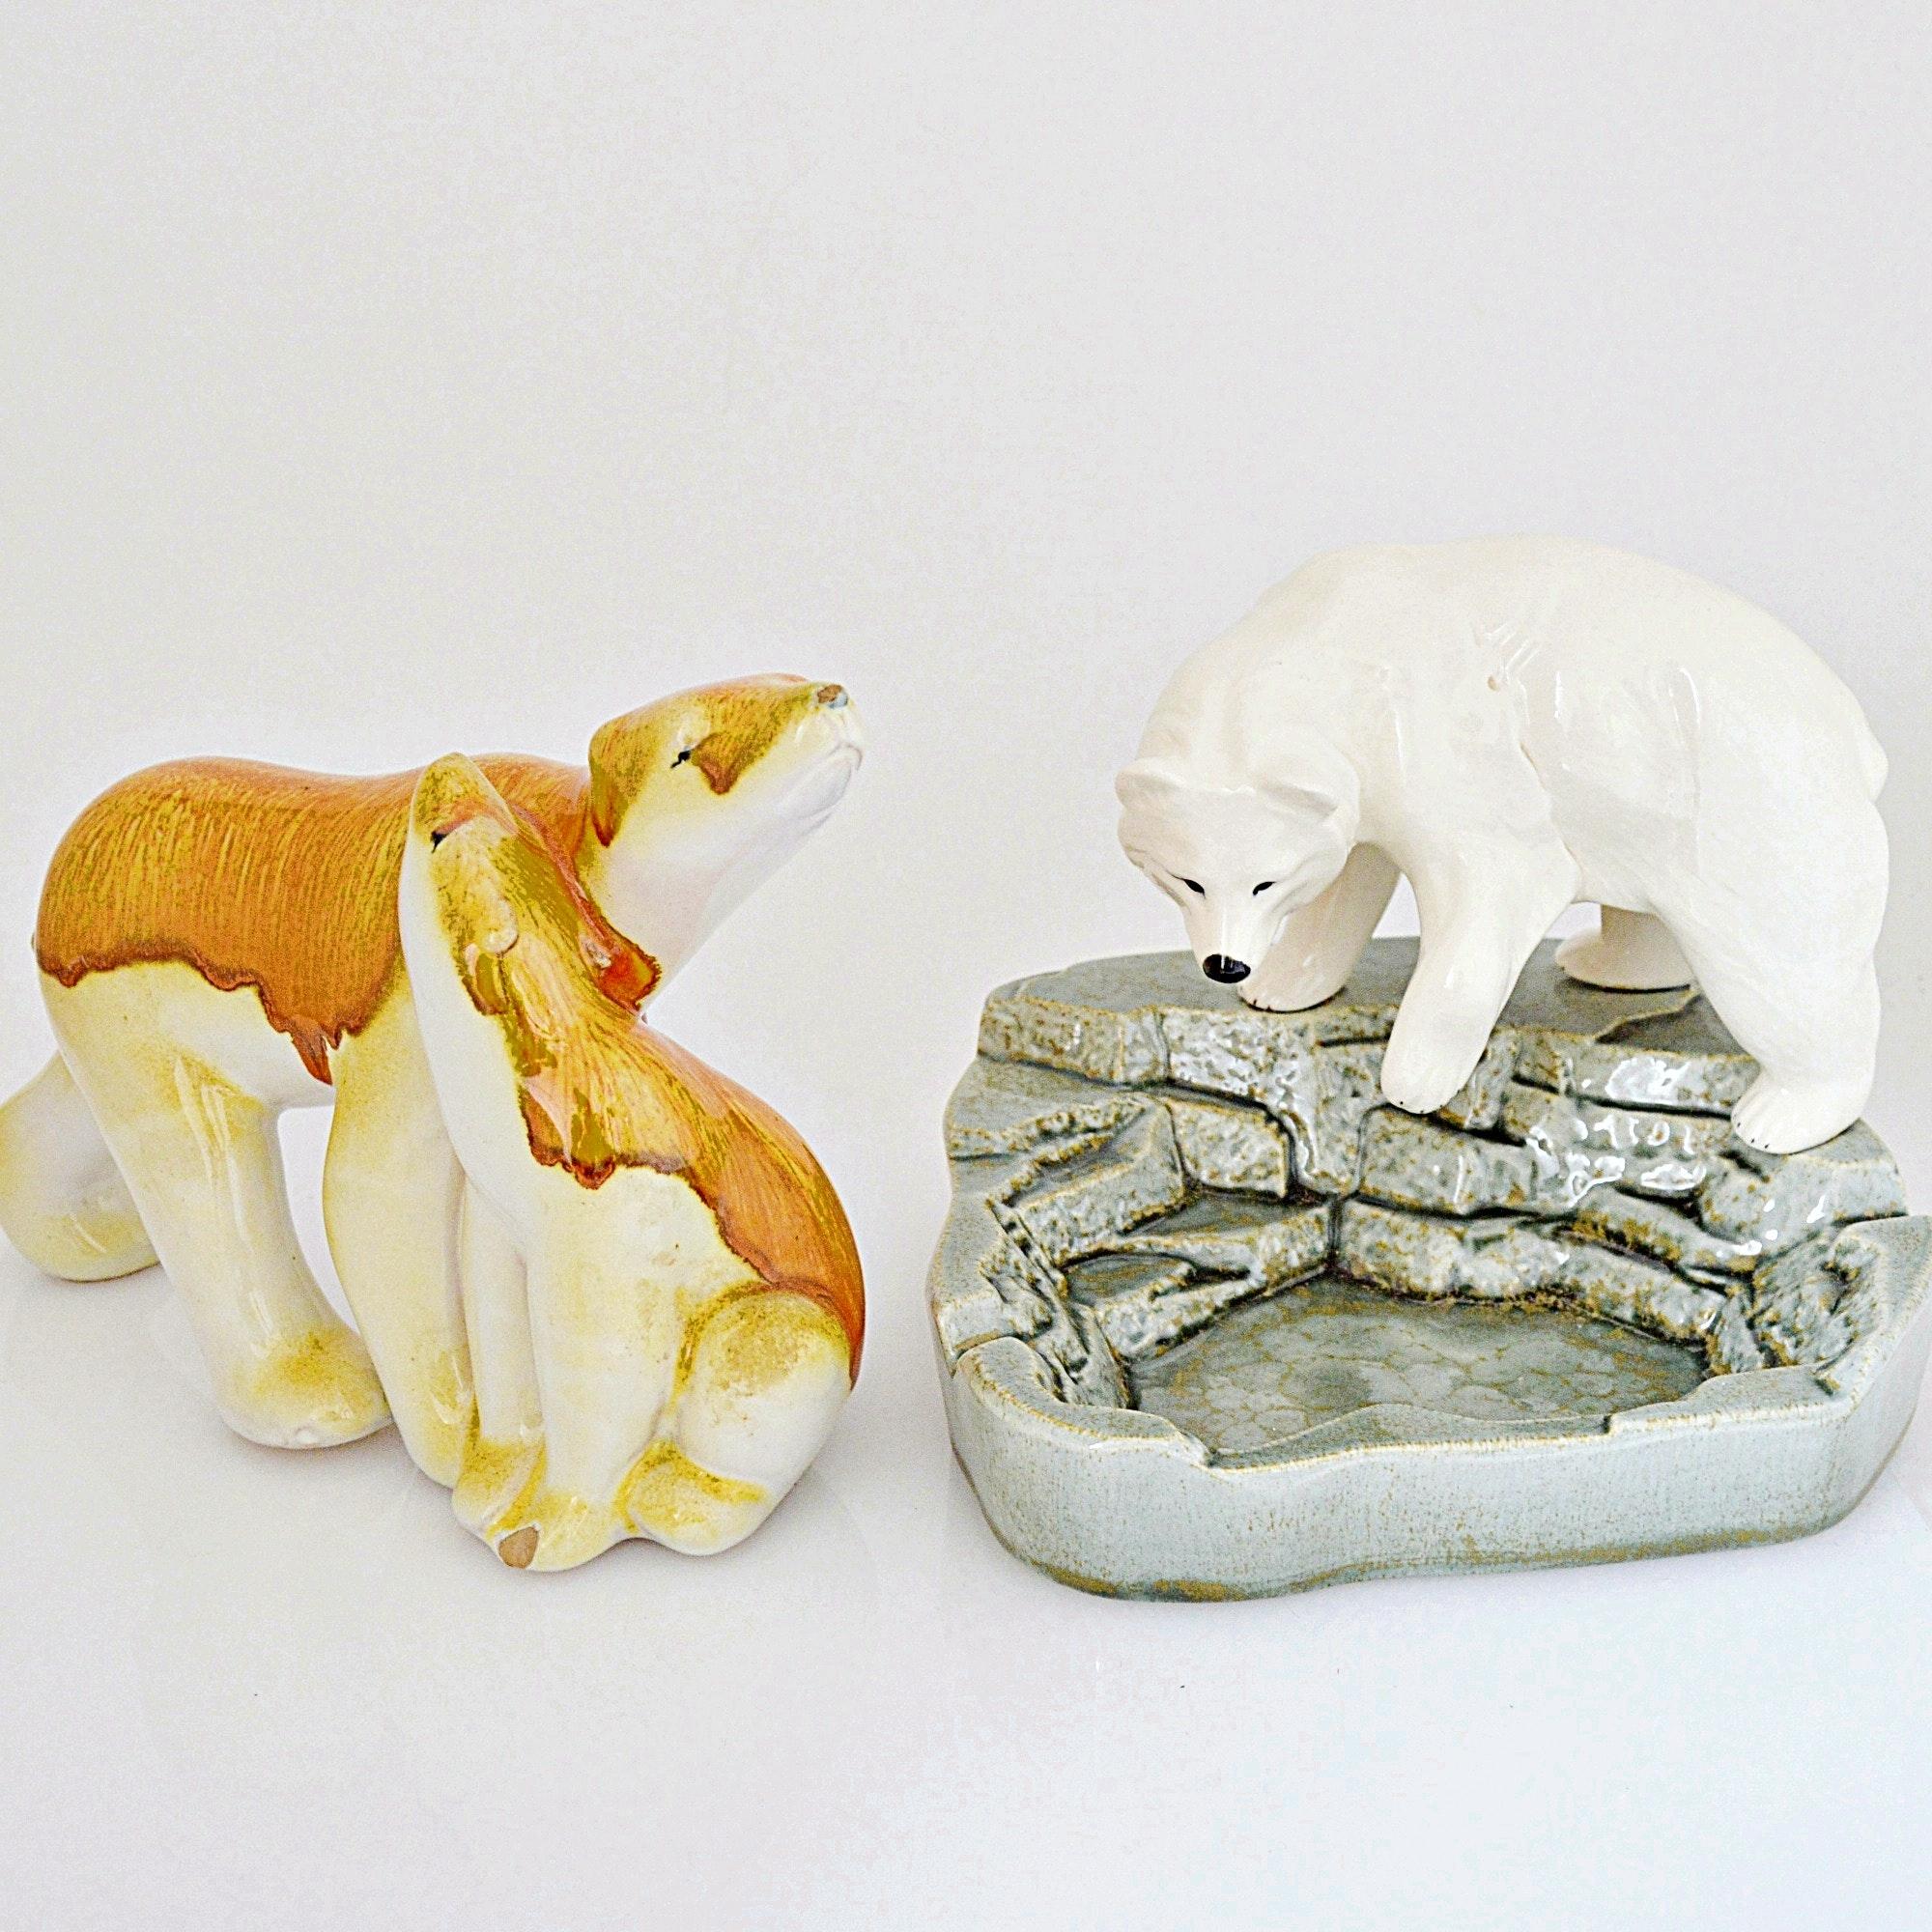 Porcelain and Ceramic Polar Bear Figurines